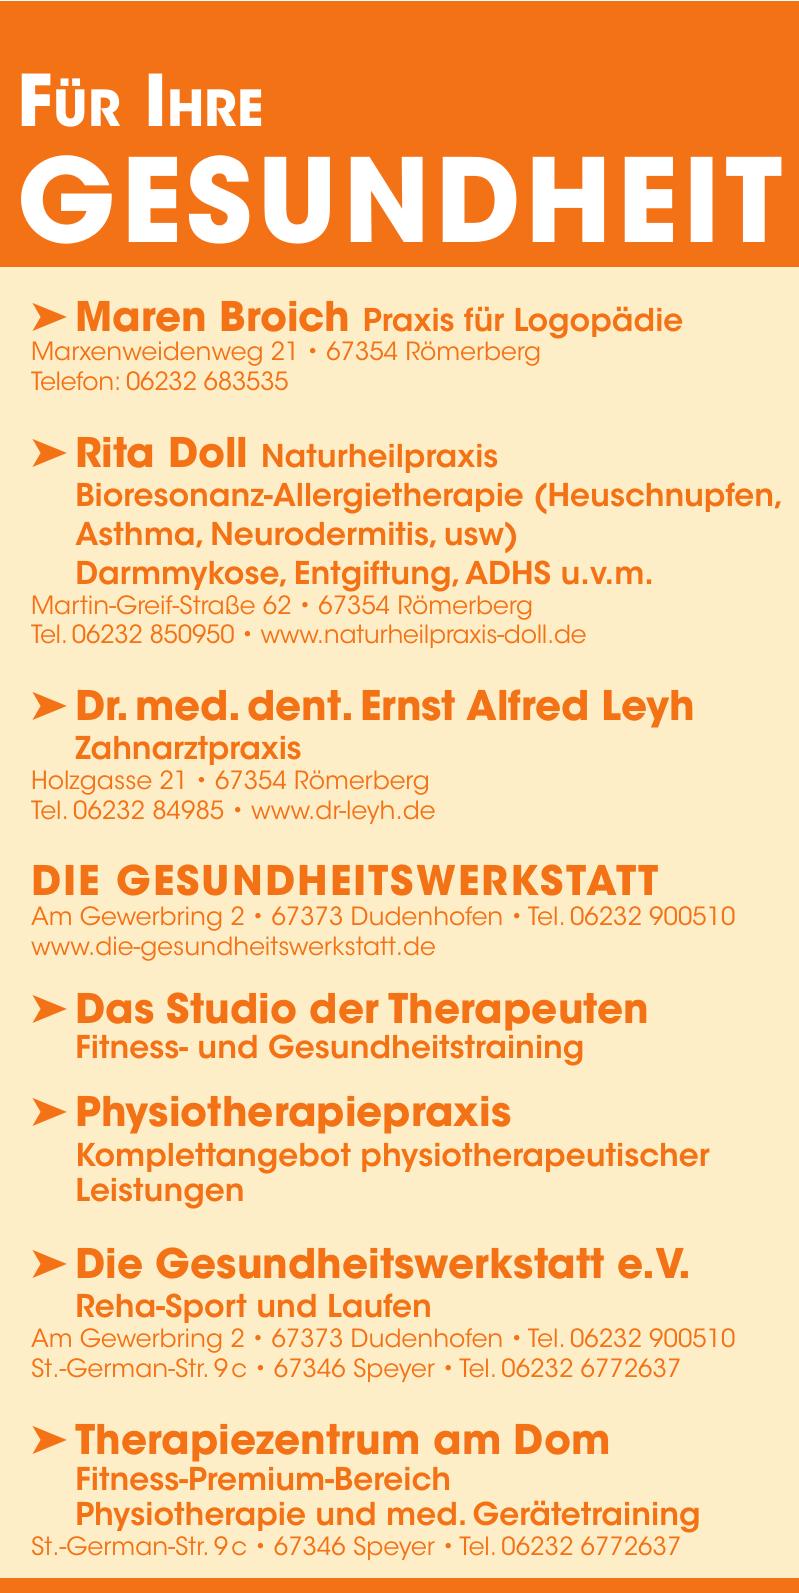 Therapiezentrum am Dom